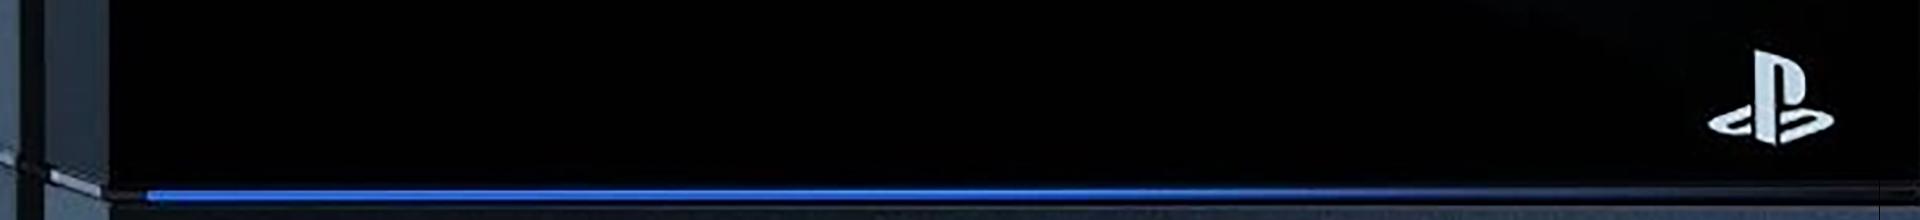 2013 PS4